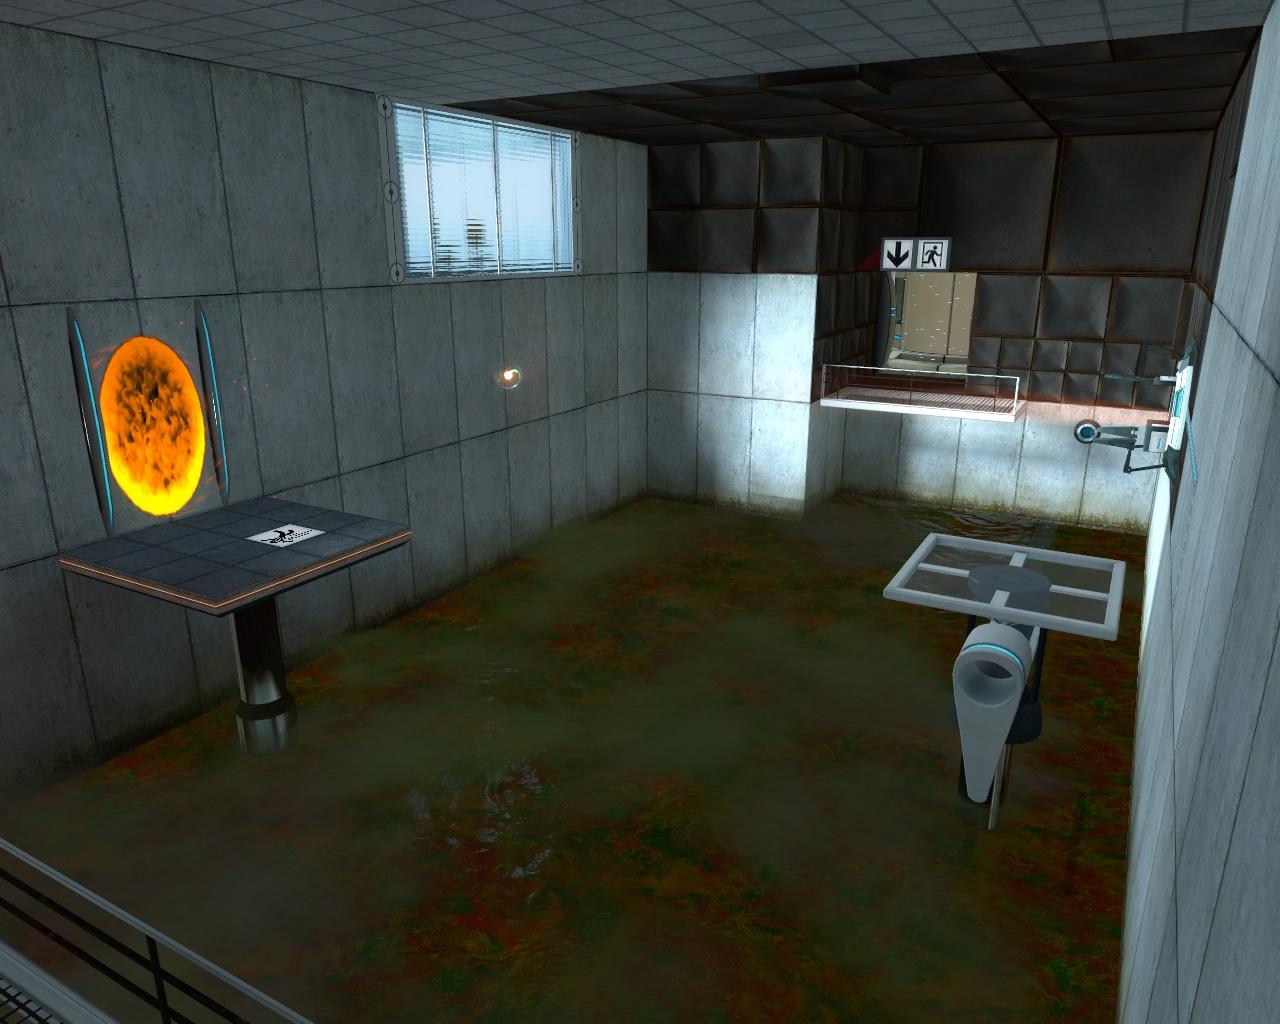 Portal-Test8.jpg